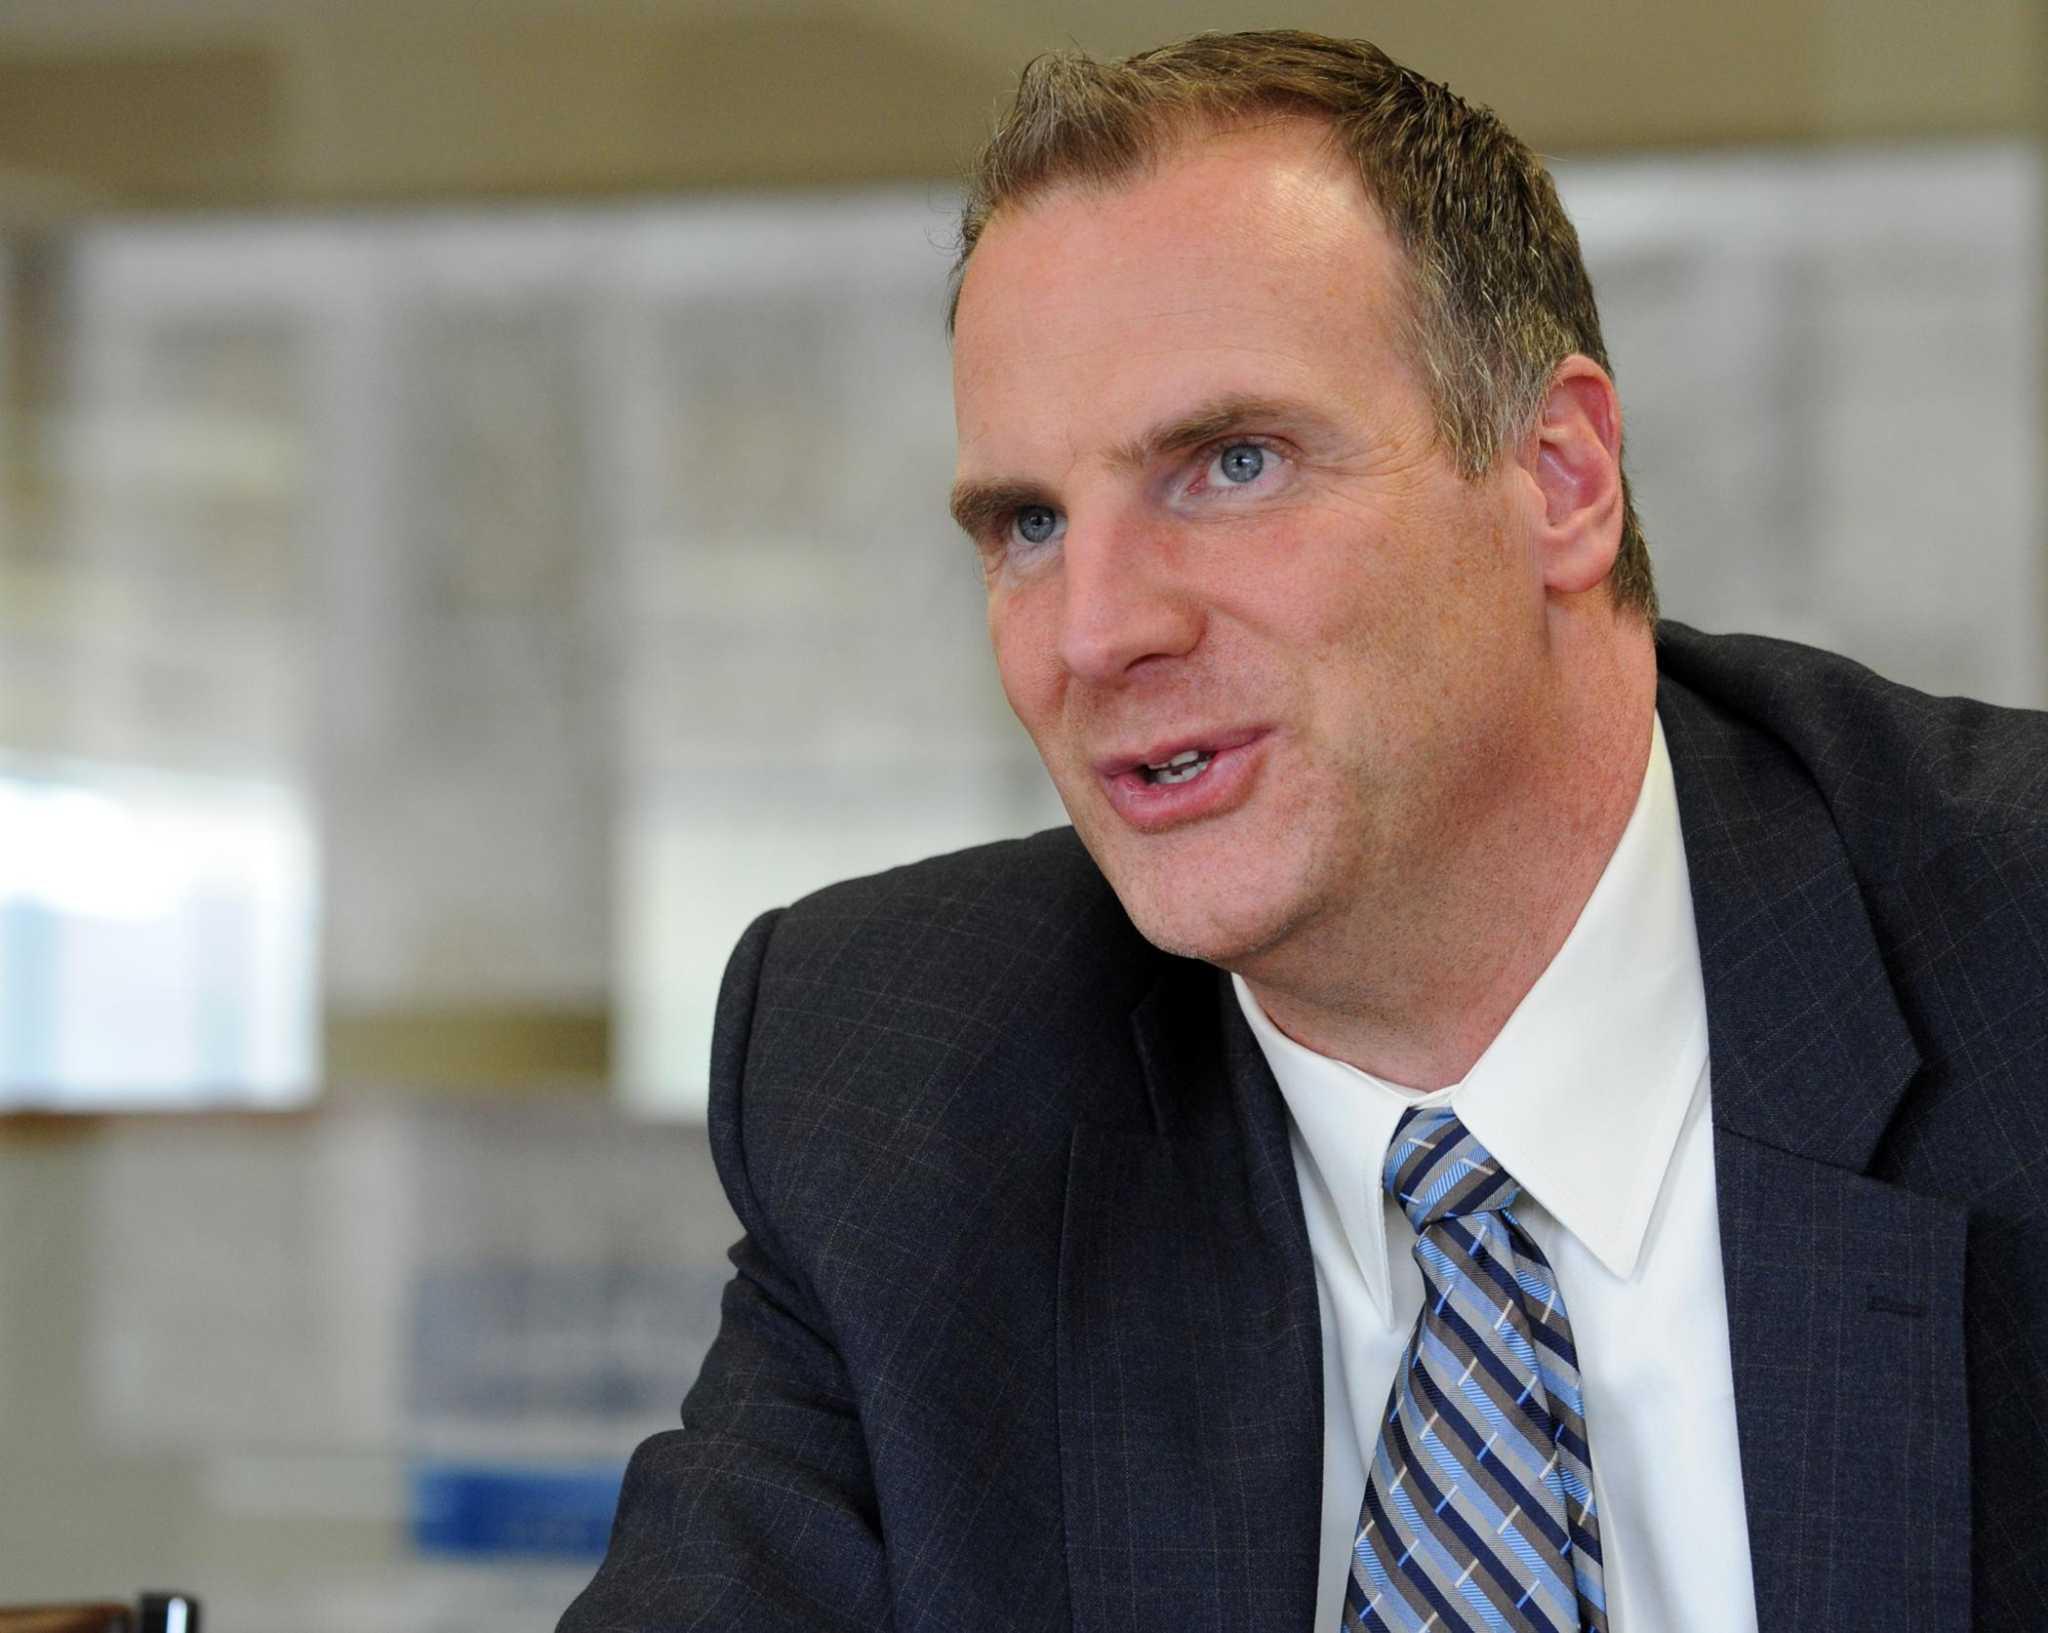 Connecticut teacher pension cost debate not over yet